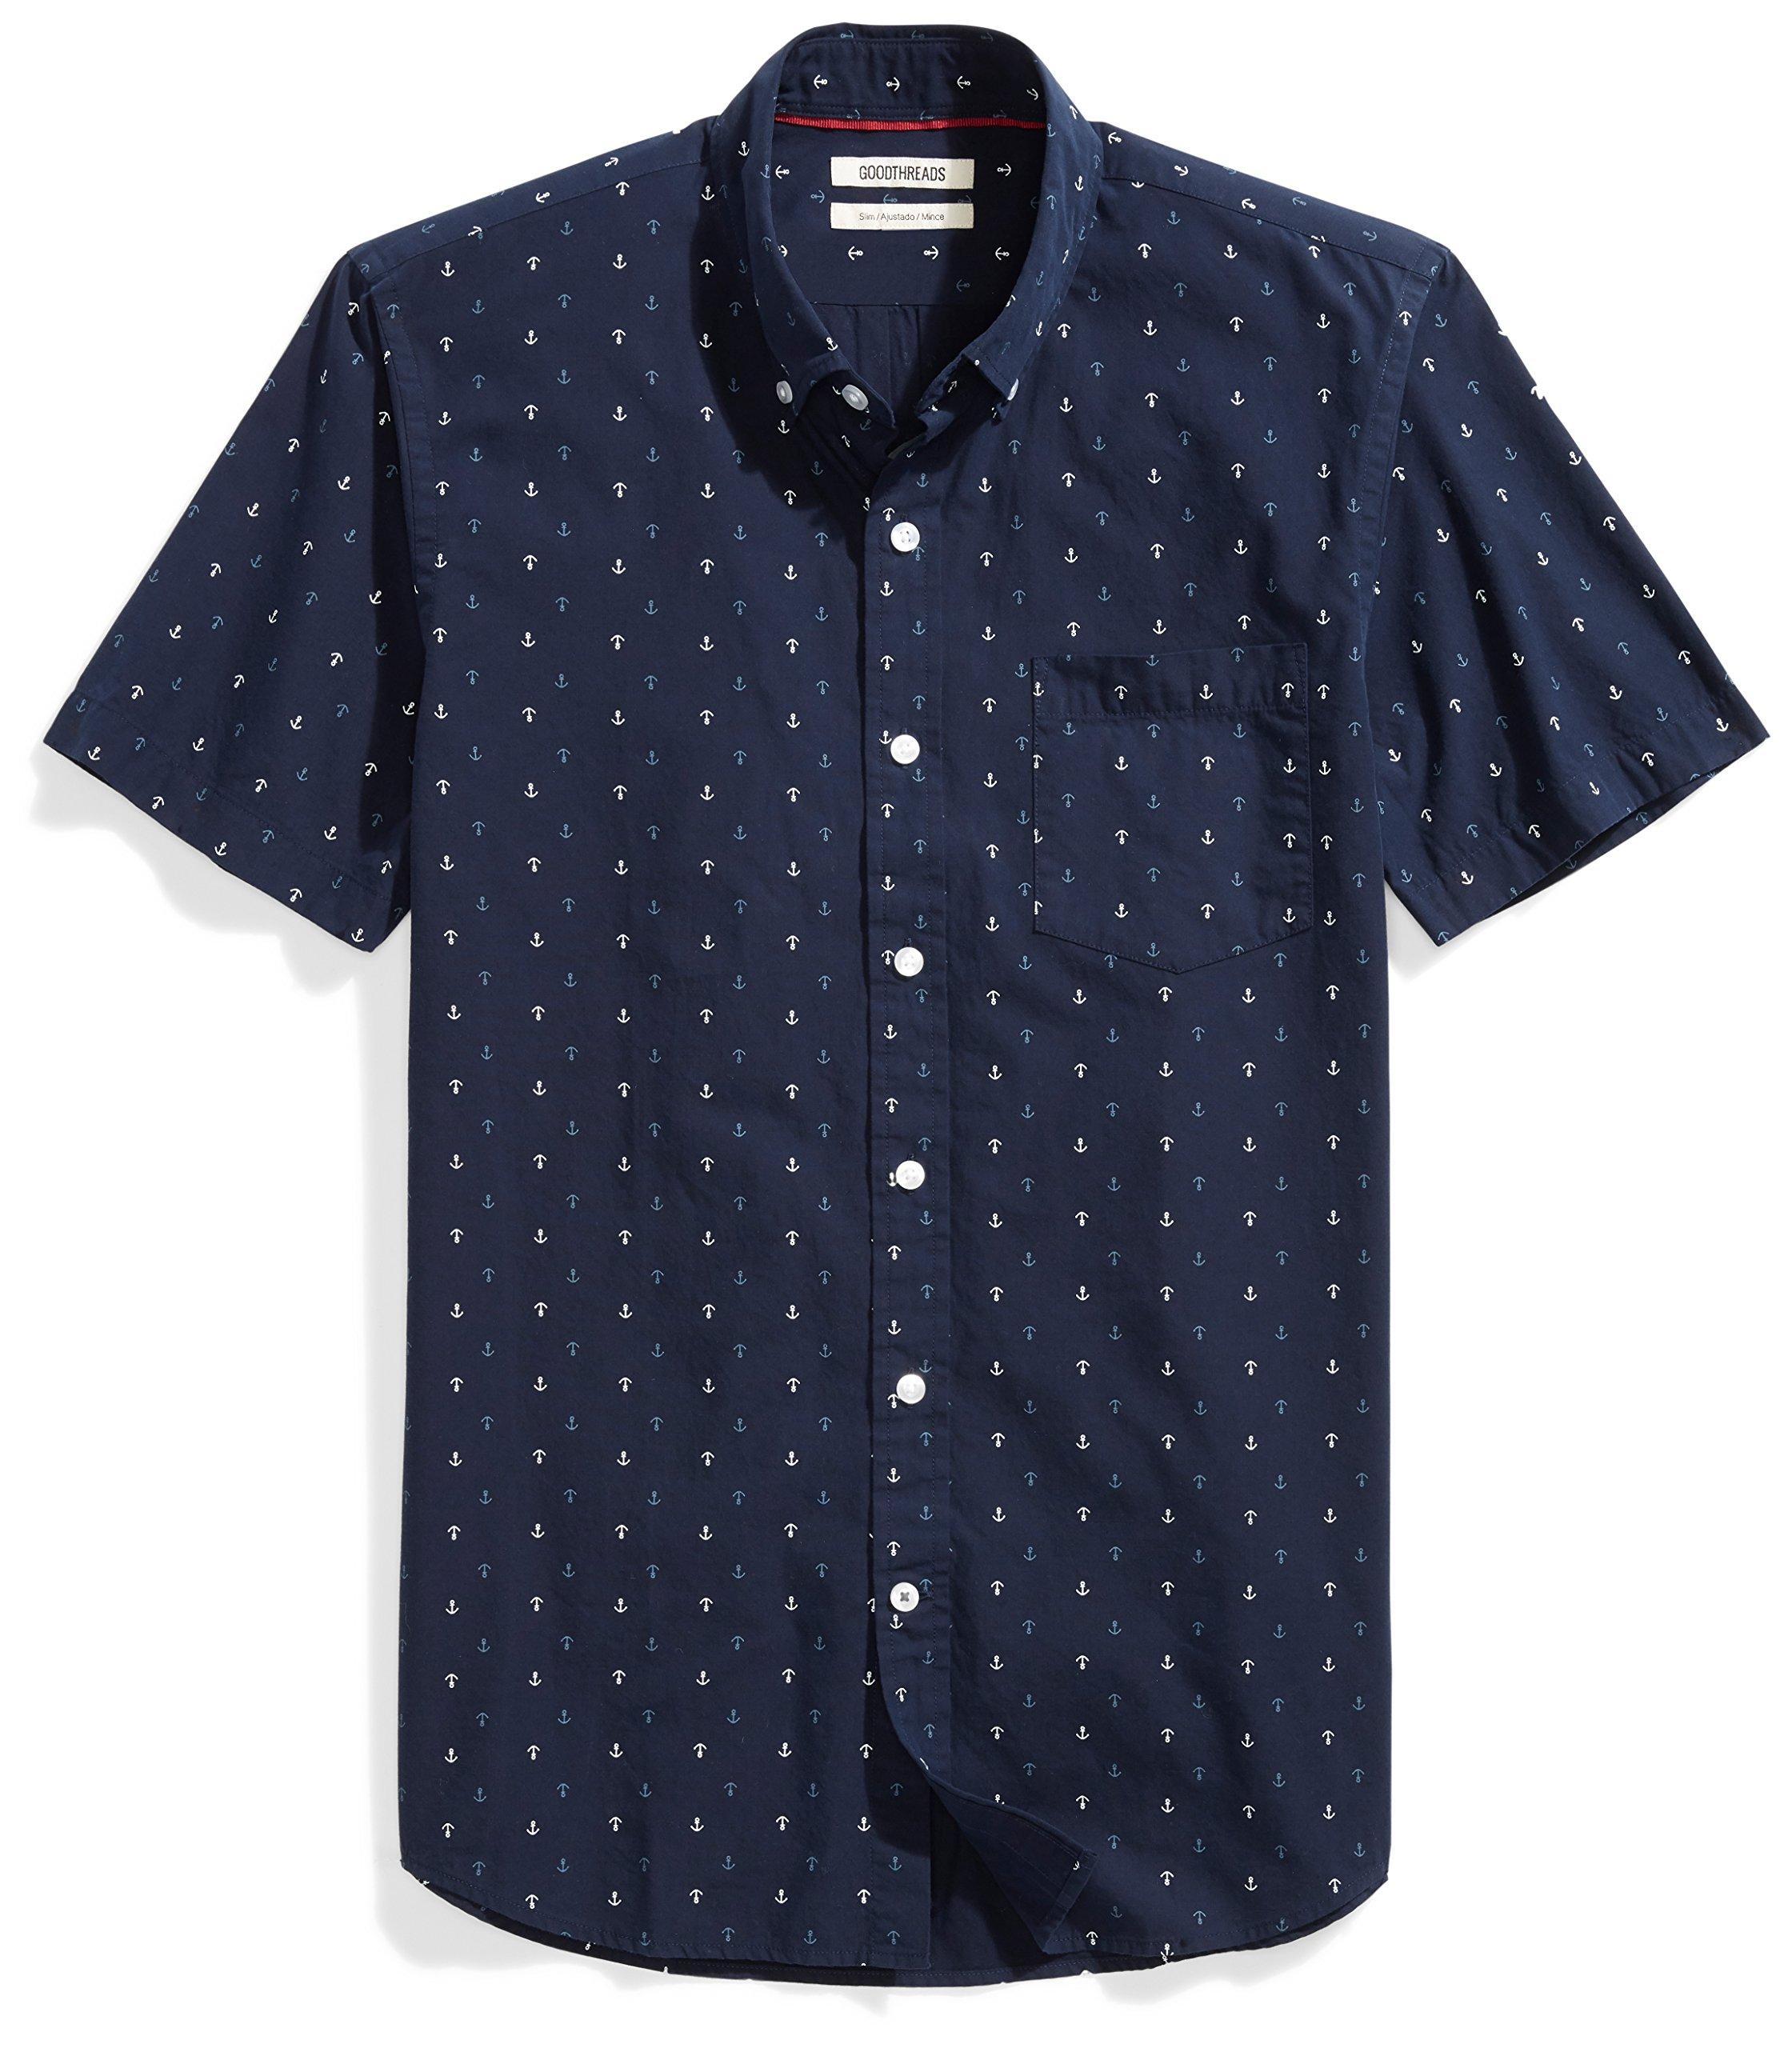 Goodthreads Men's Slim-Fit Short-Sleeve Printed Shirt, -navy ground anchor Printed, Medium